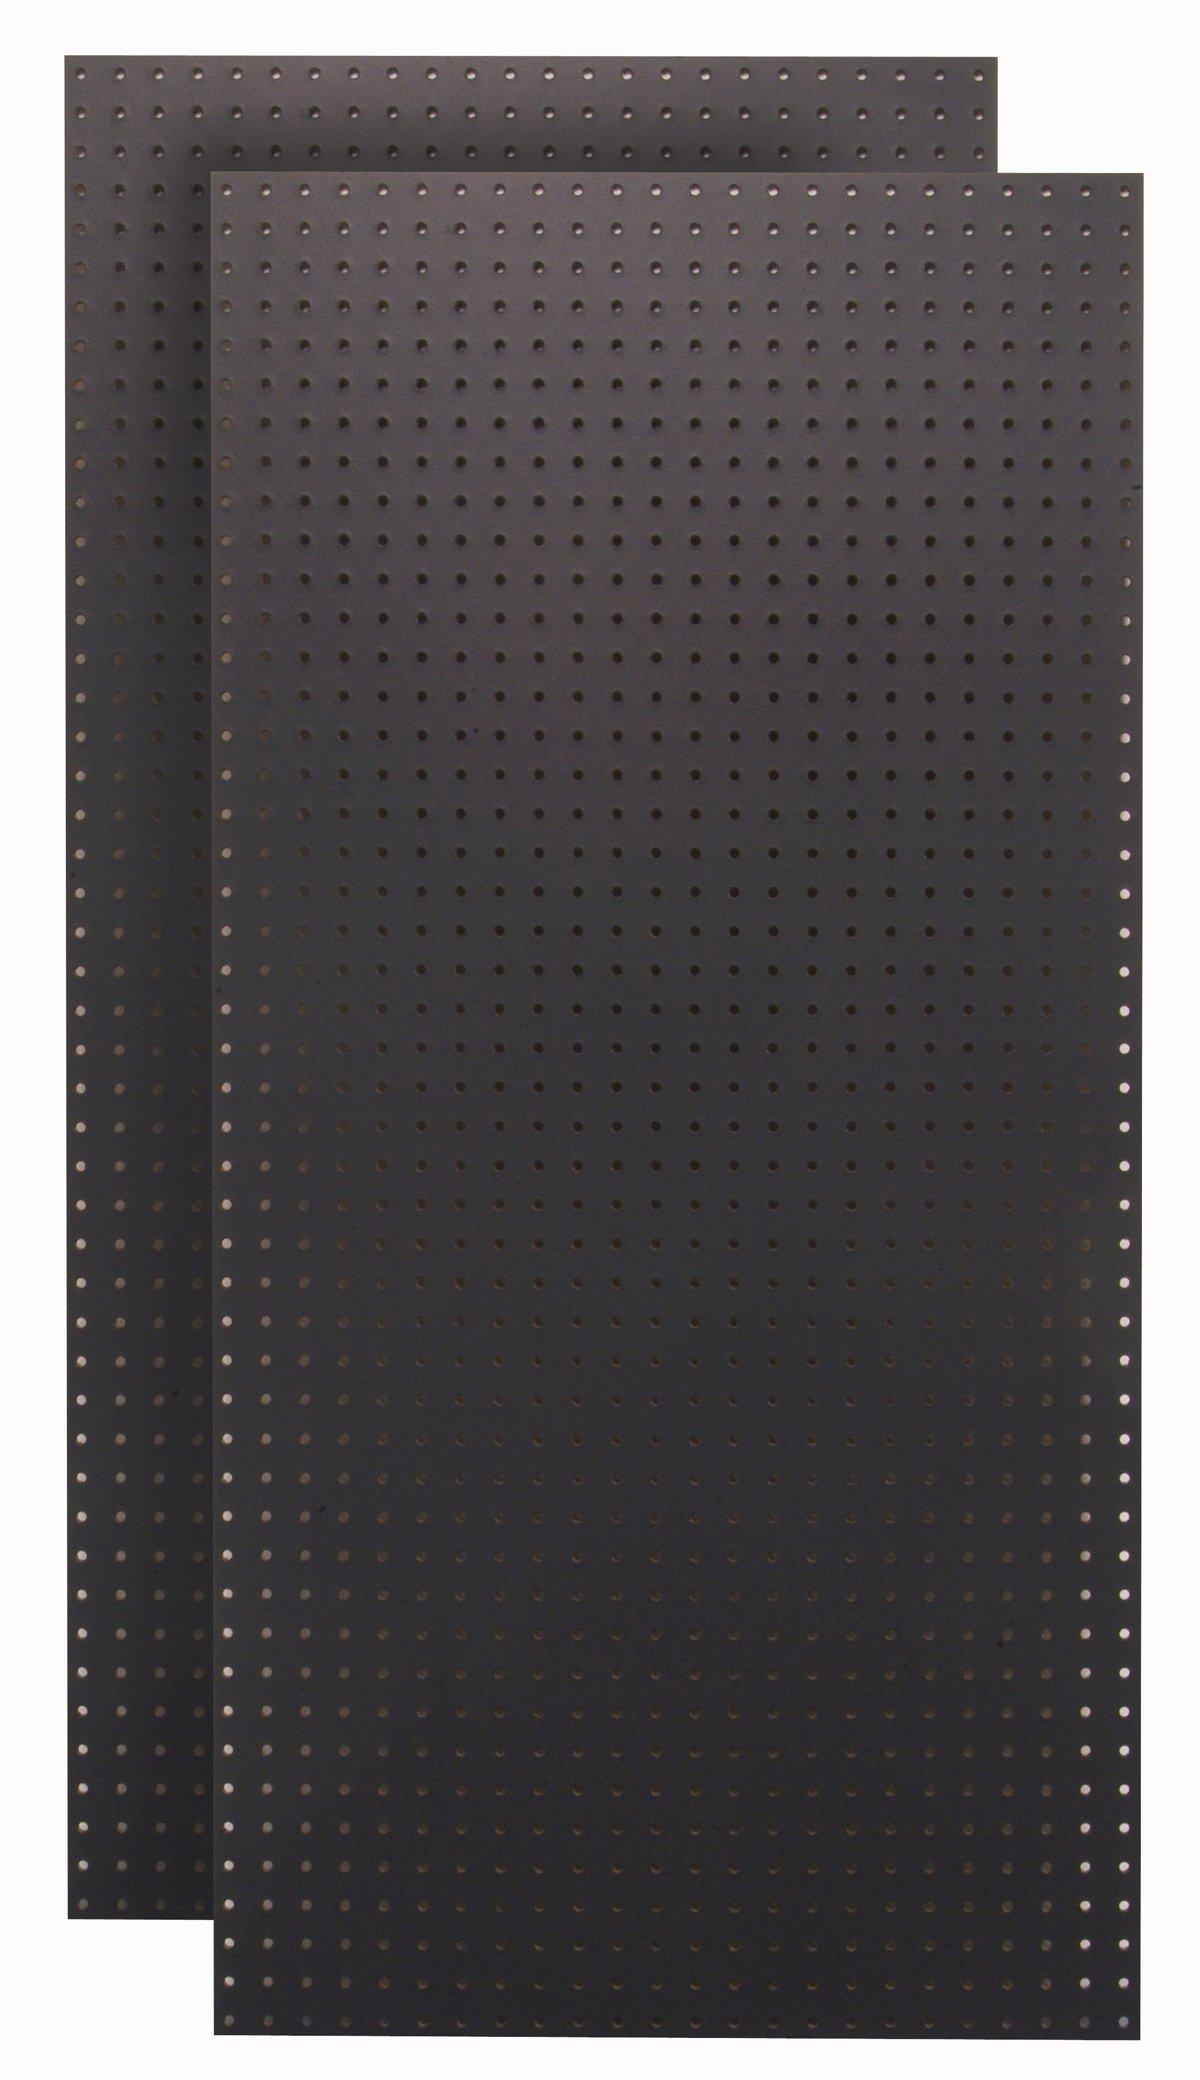 Triton Products HDB-2 (2) Black Hdf Pegboards